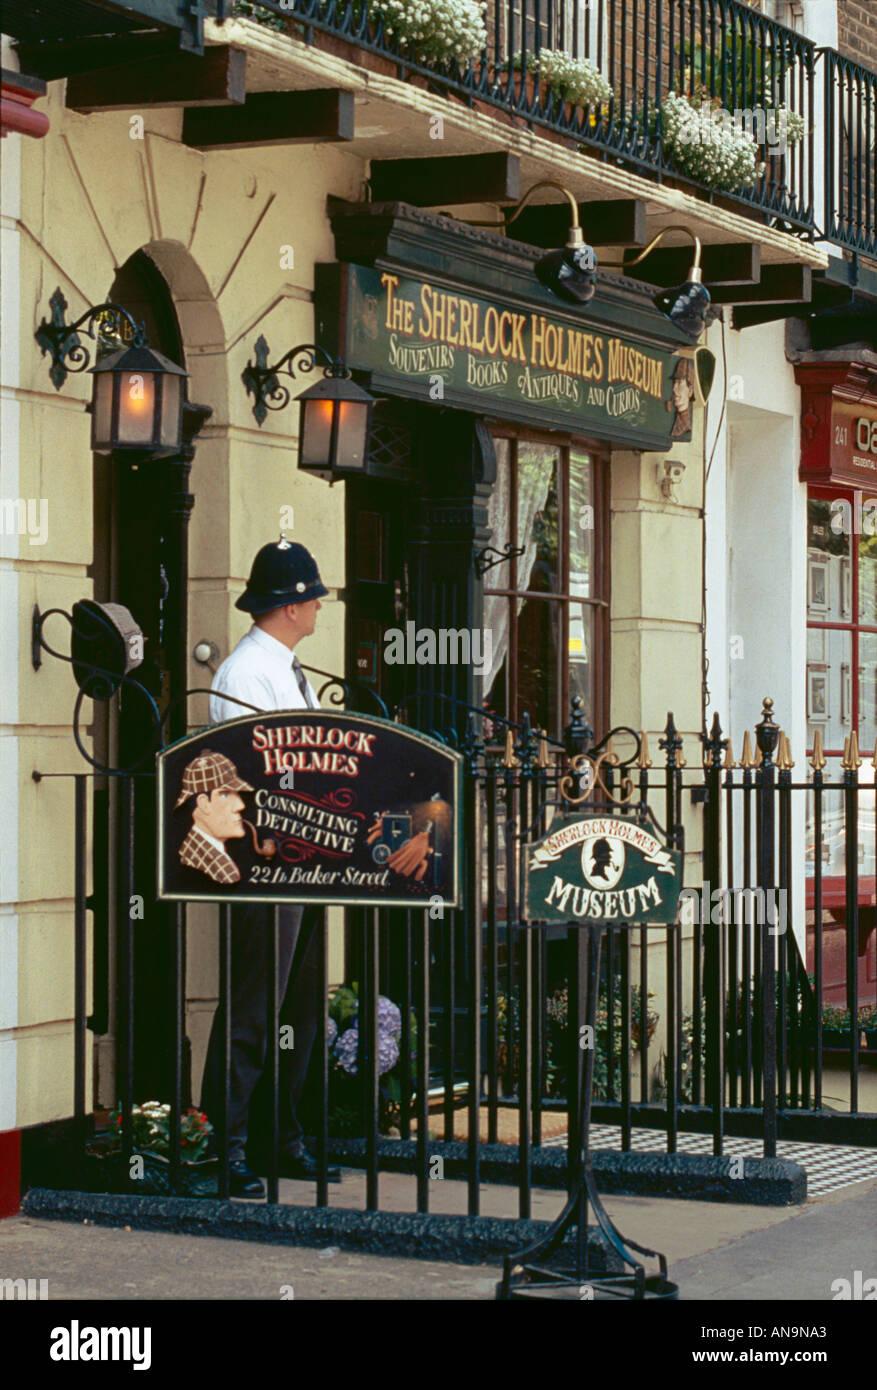 Sherlock Holmes Baker Street Stock Photos & Sherlock Holmes